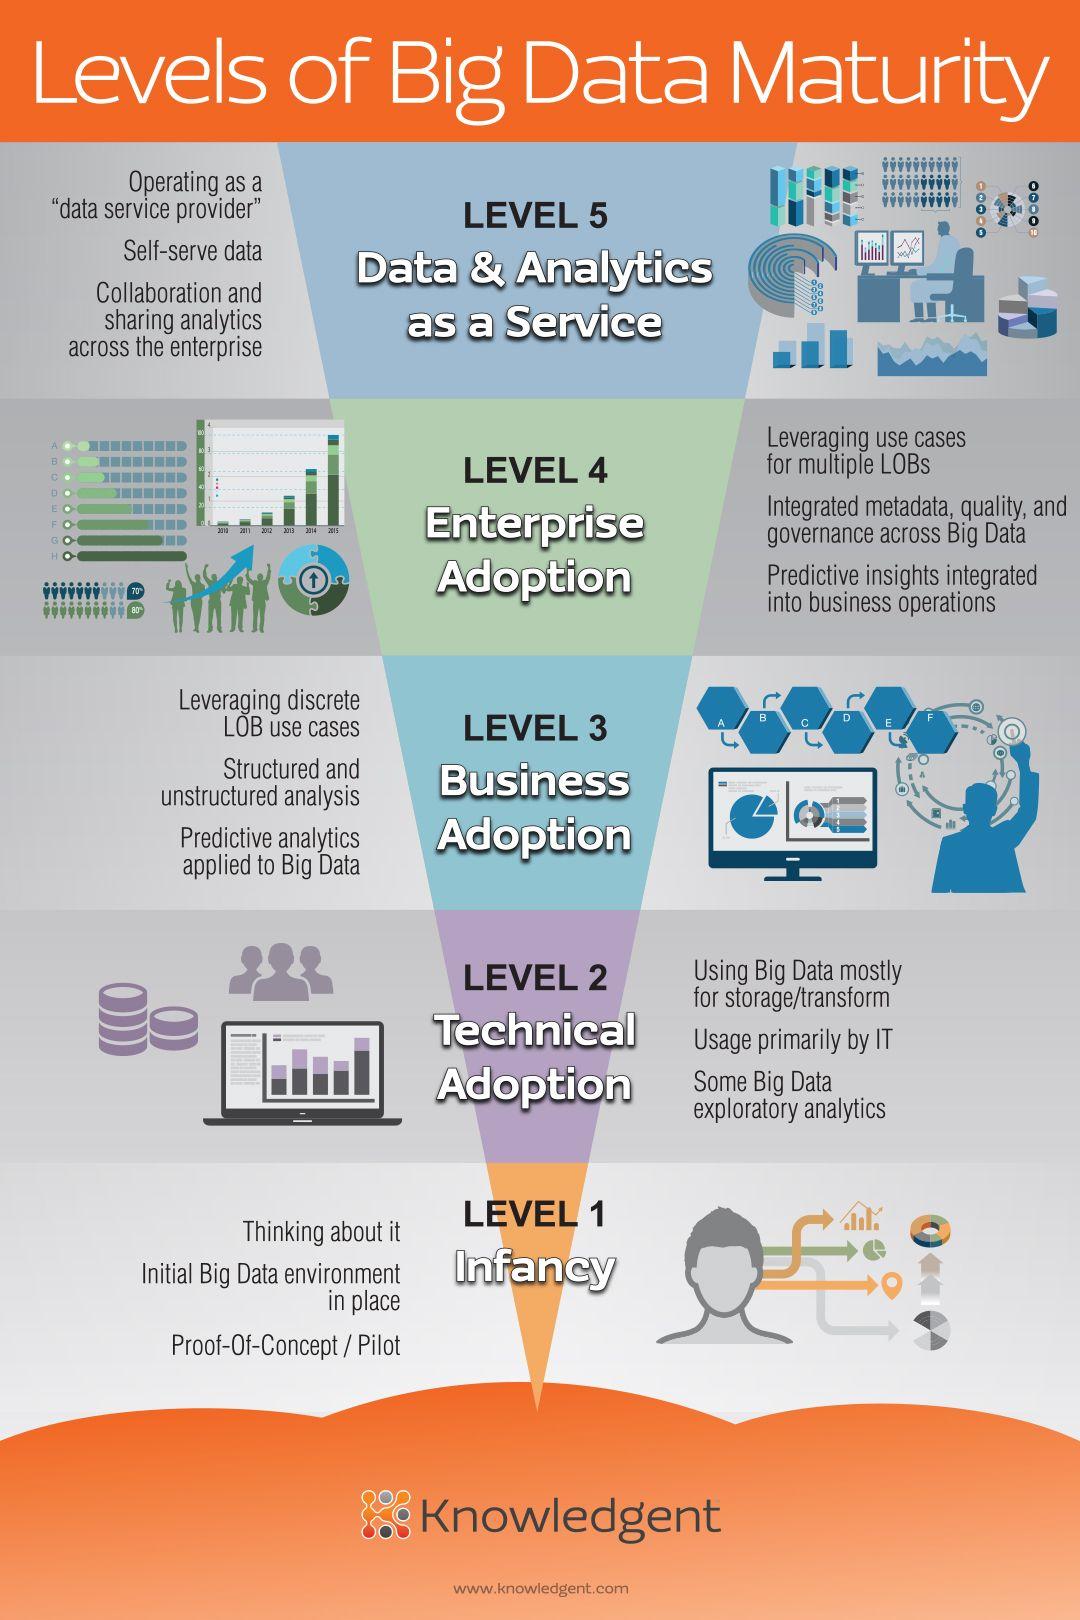 Levels Of Big Data Maturity Infographic Knowledgent Big Data Data Science Big Data Analytics